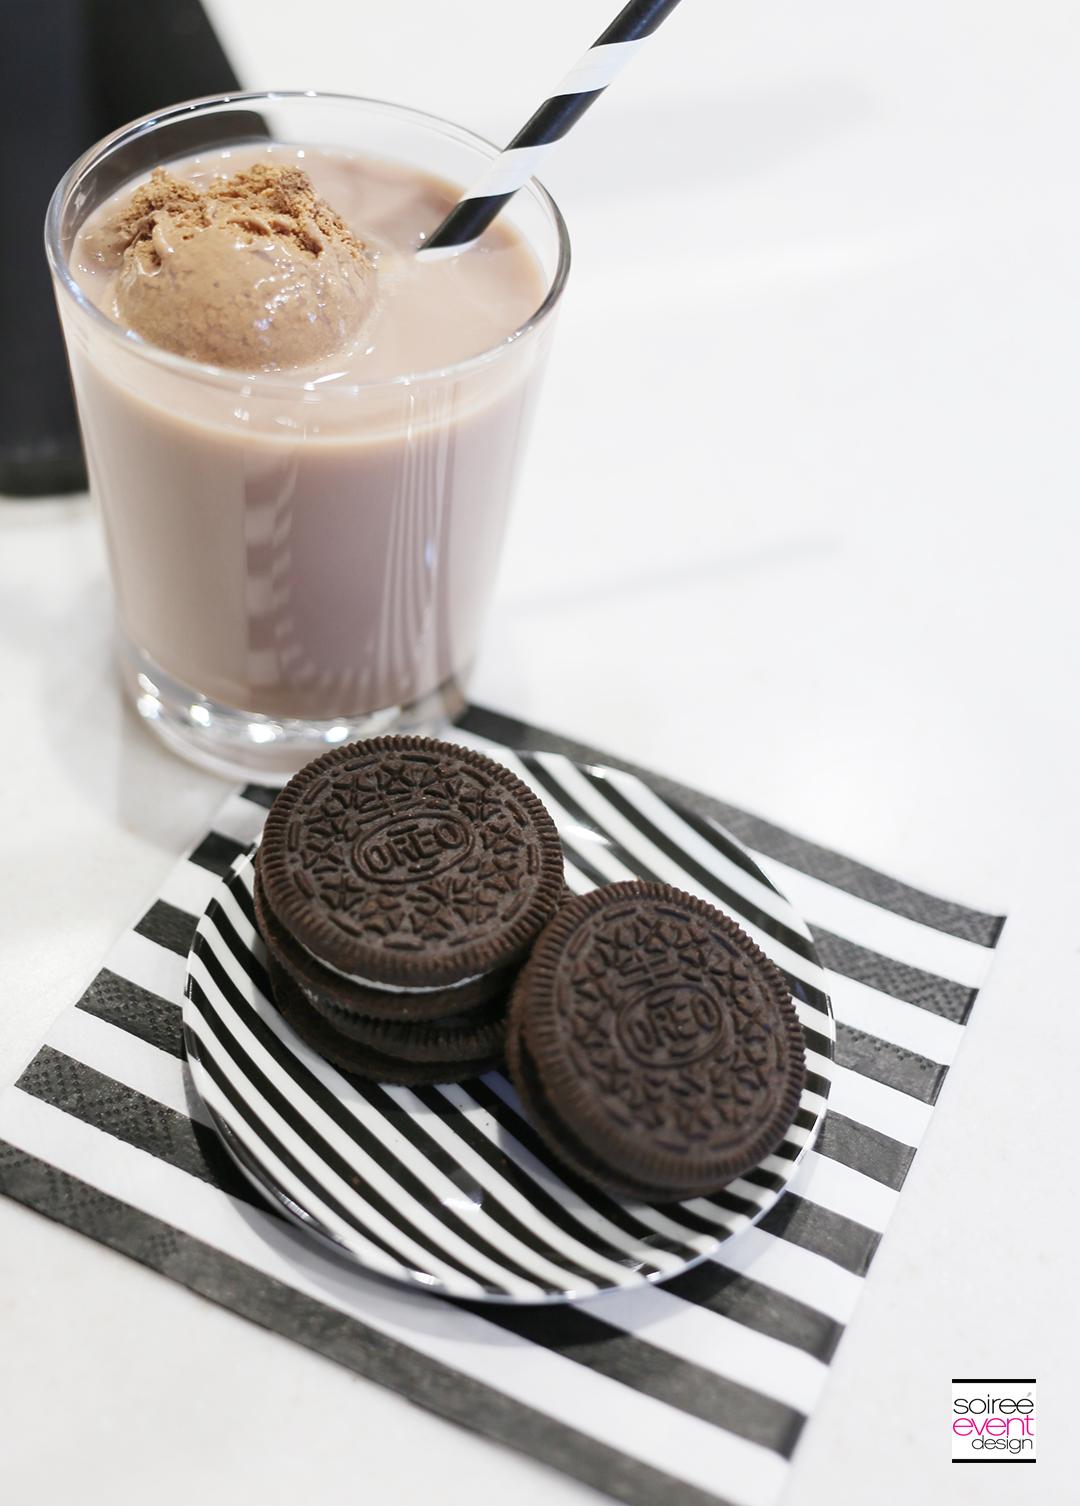 Chocolate Milk and OREO Cookies